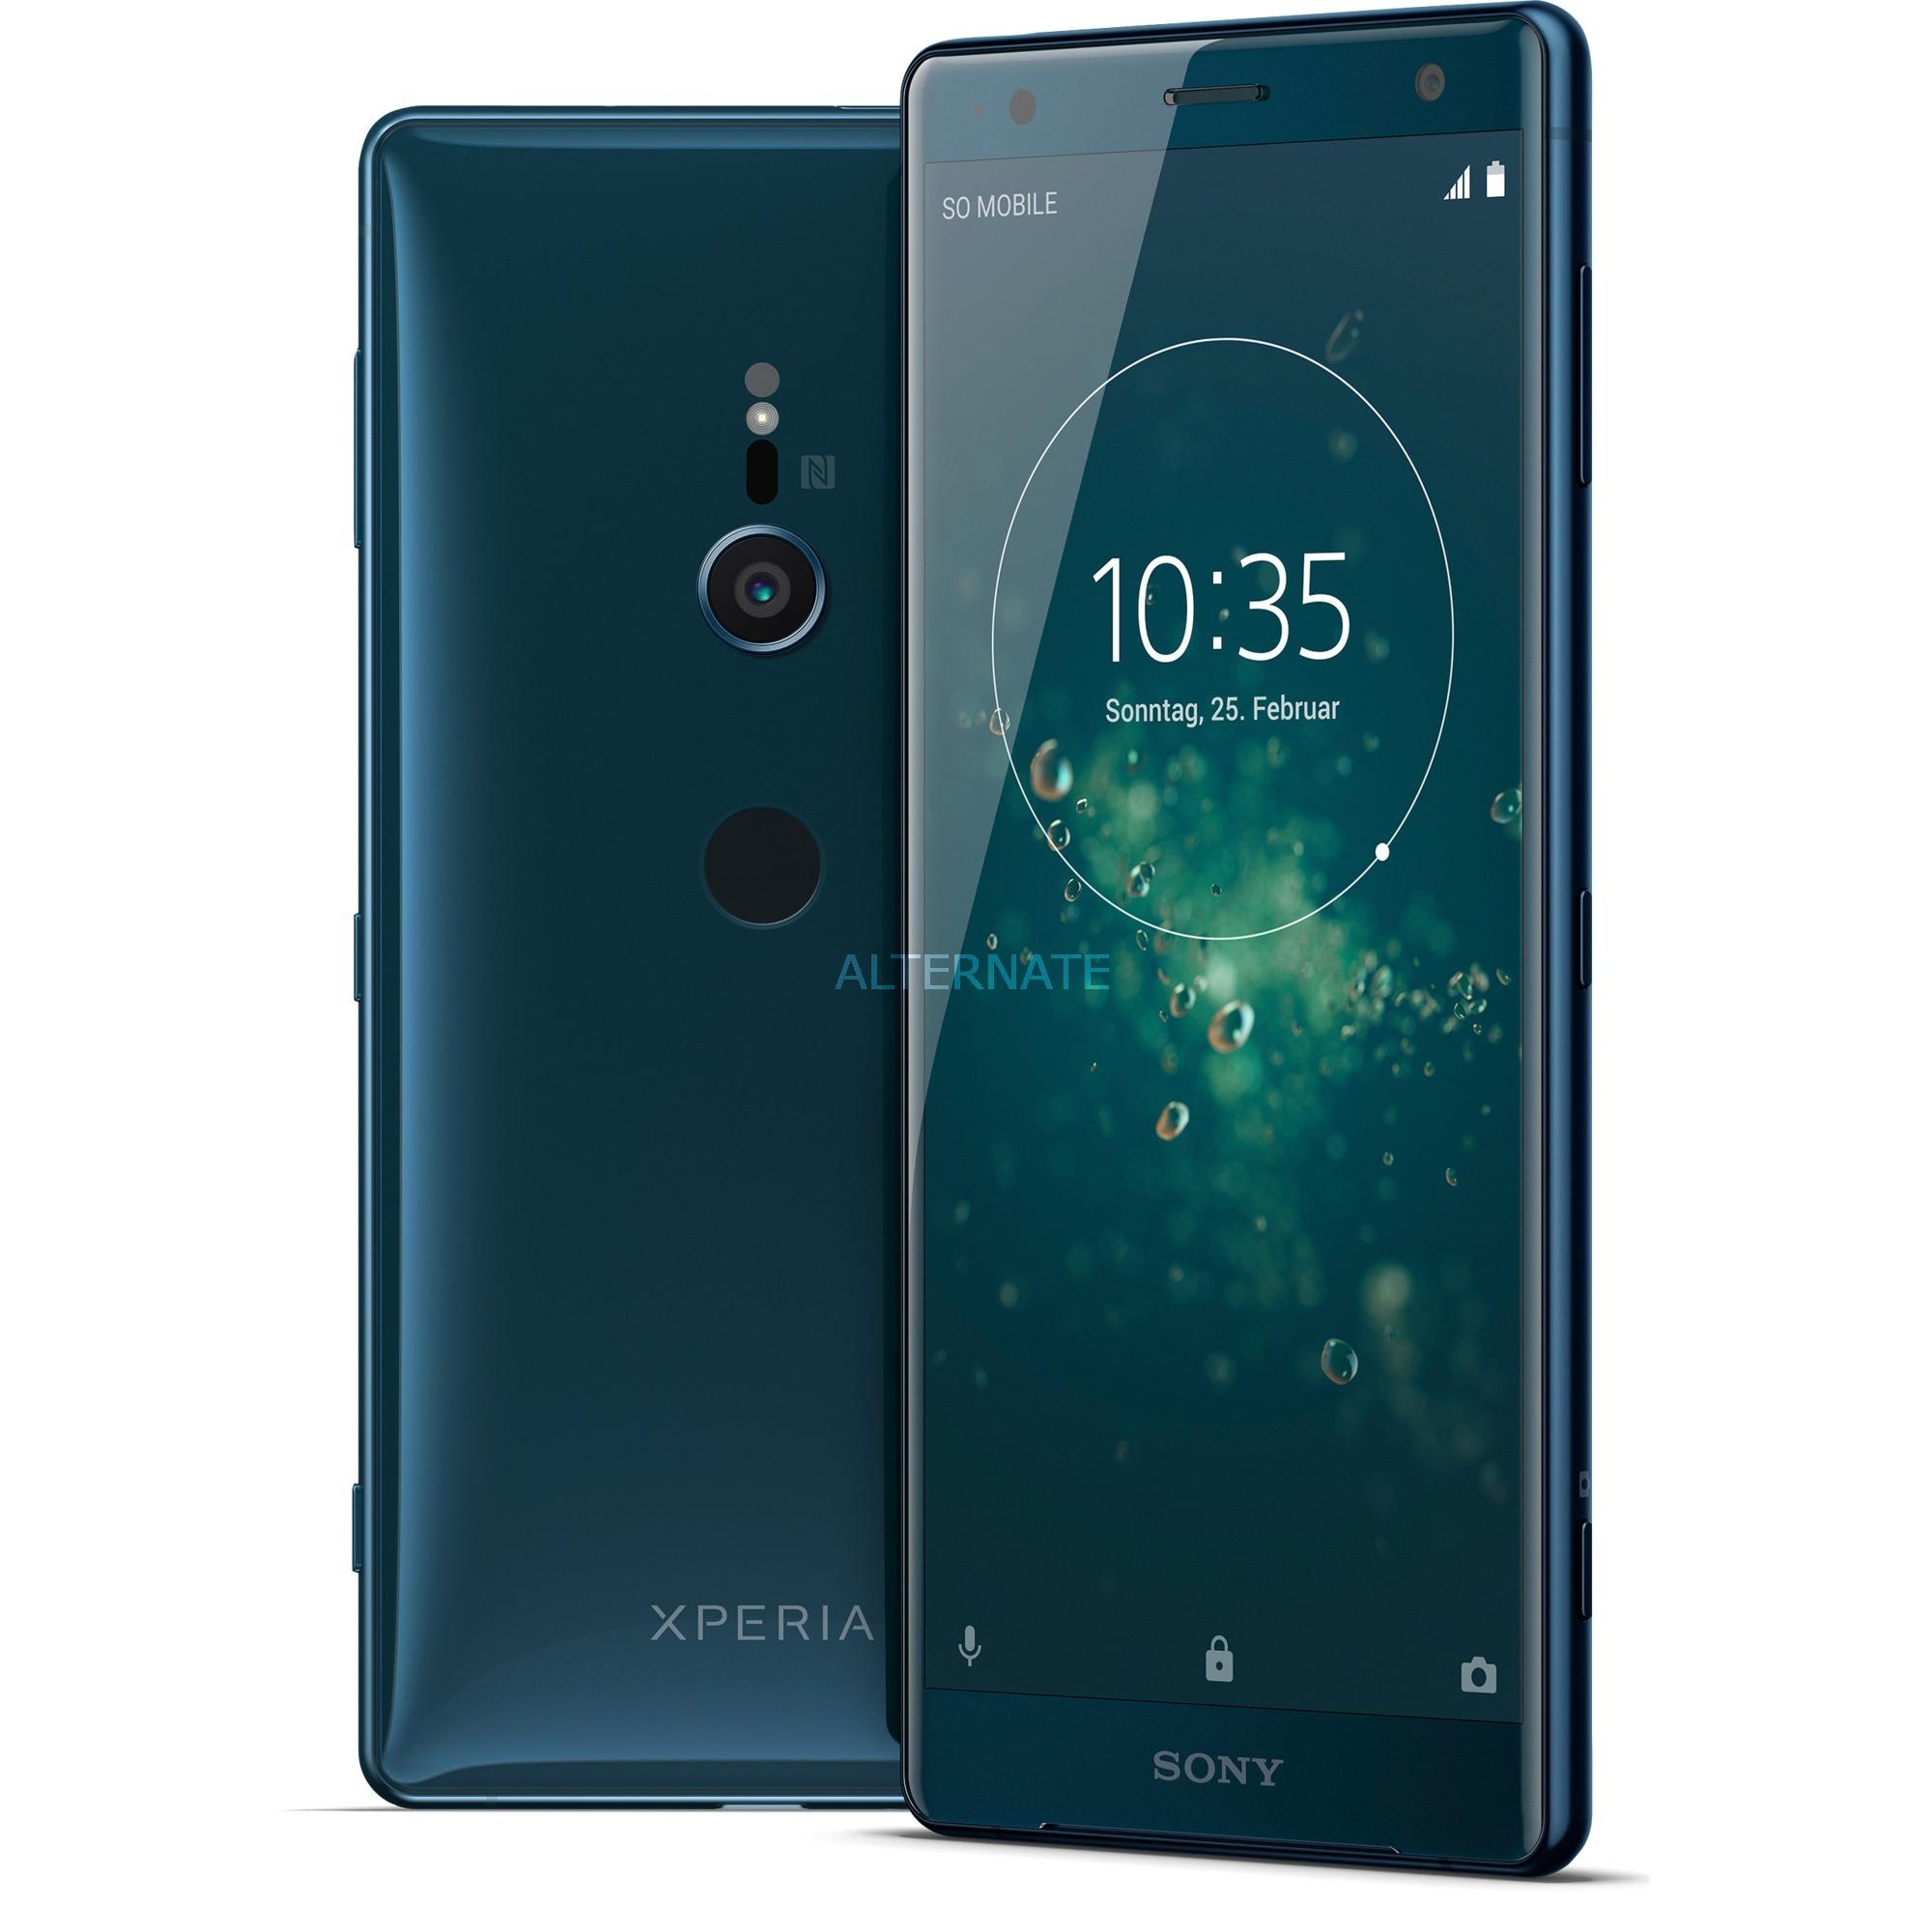 Xperia XZ2 Double SIM 4G 64Go Vert, Mobile